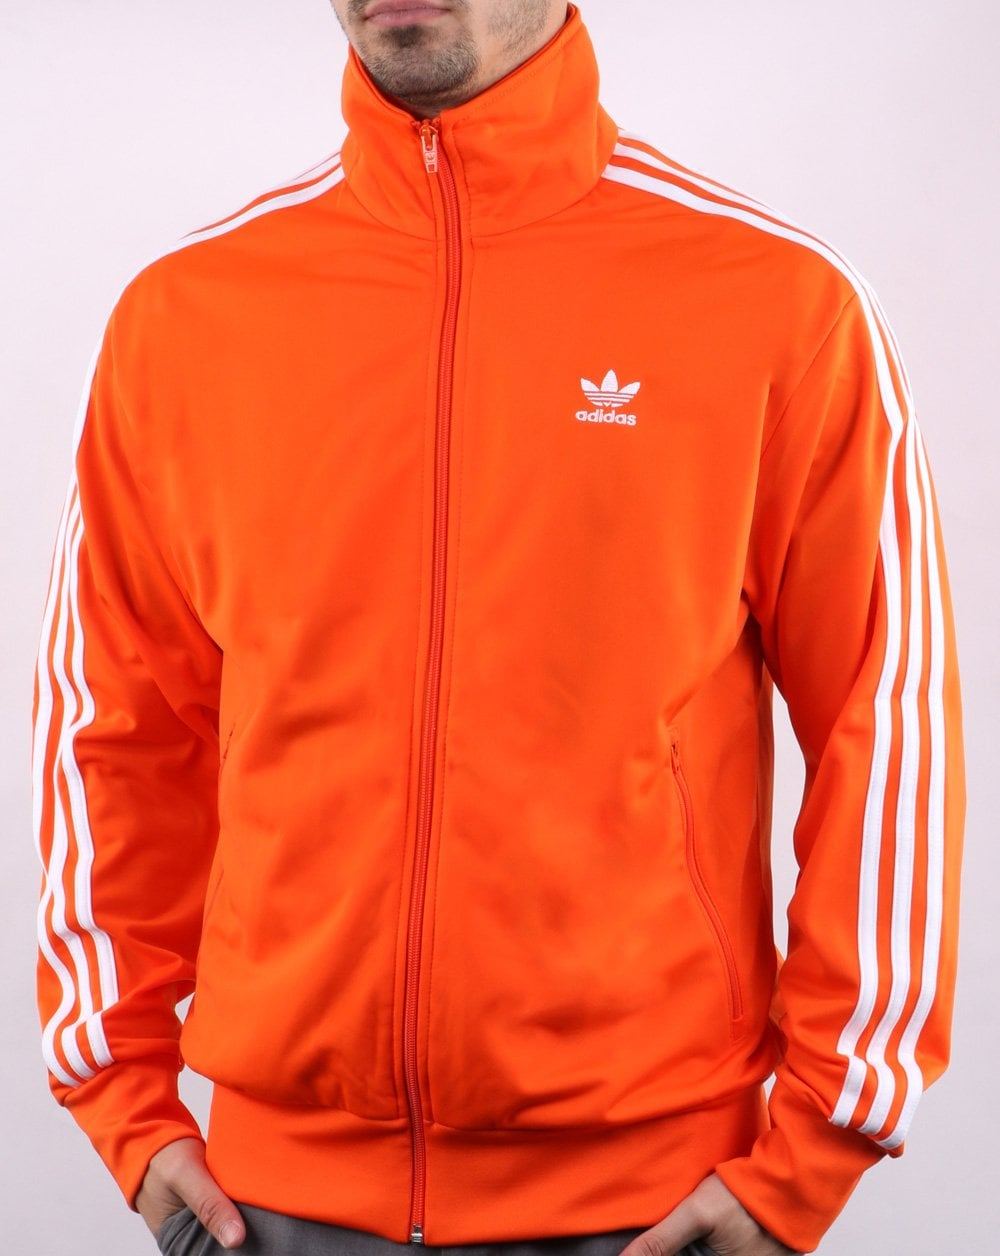 adidas jacke orange blau